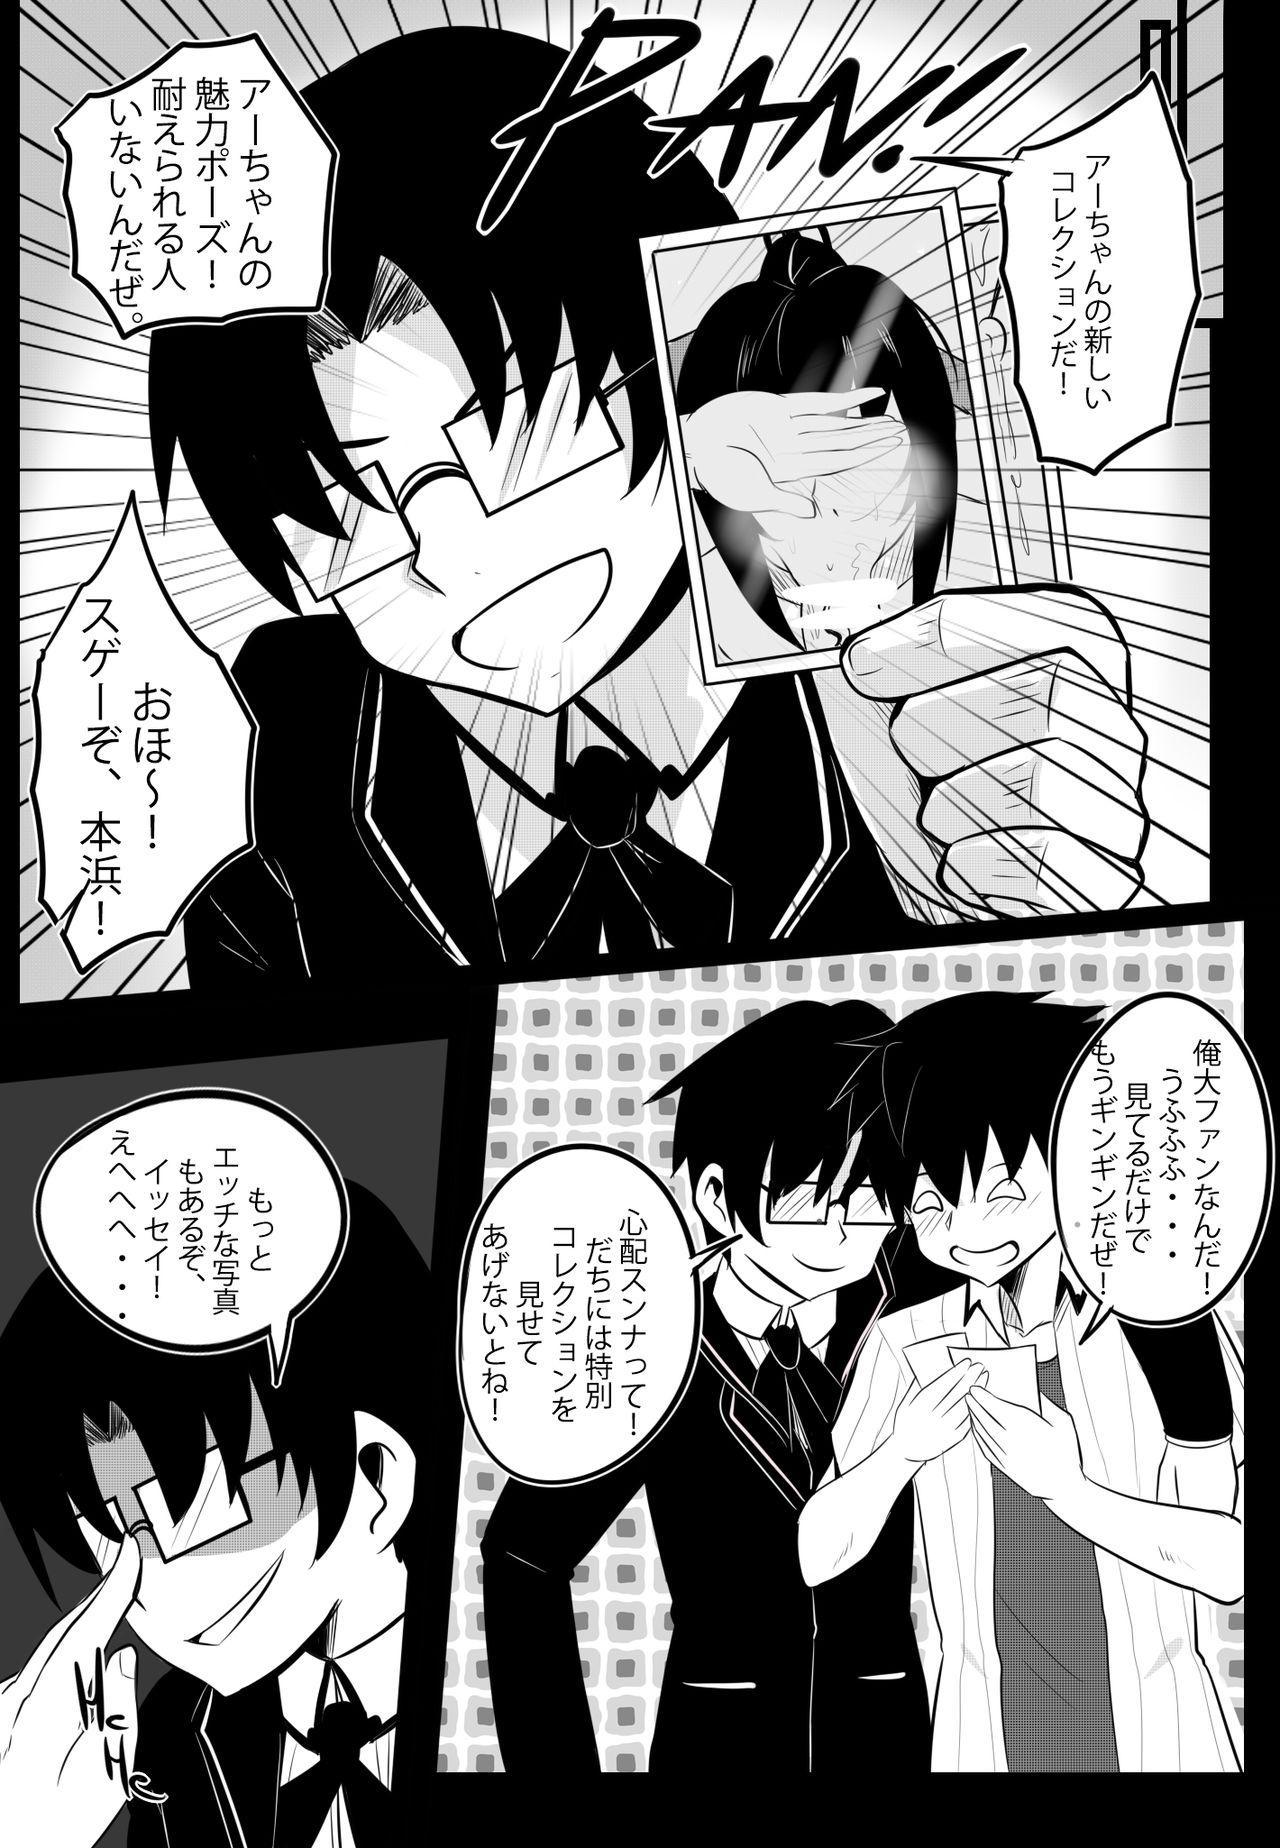 B-trayal 22-3 Akeno (Censored) JP 7